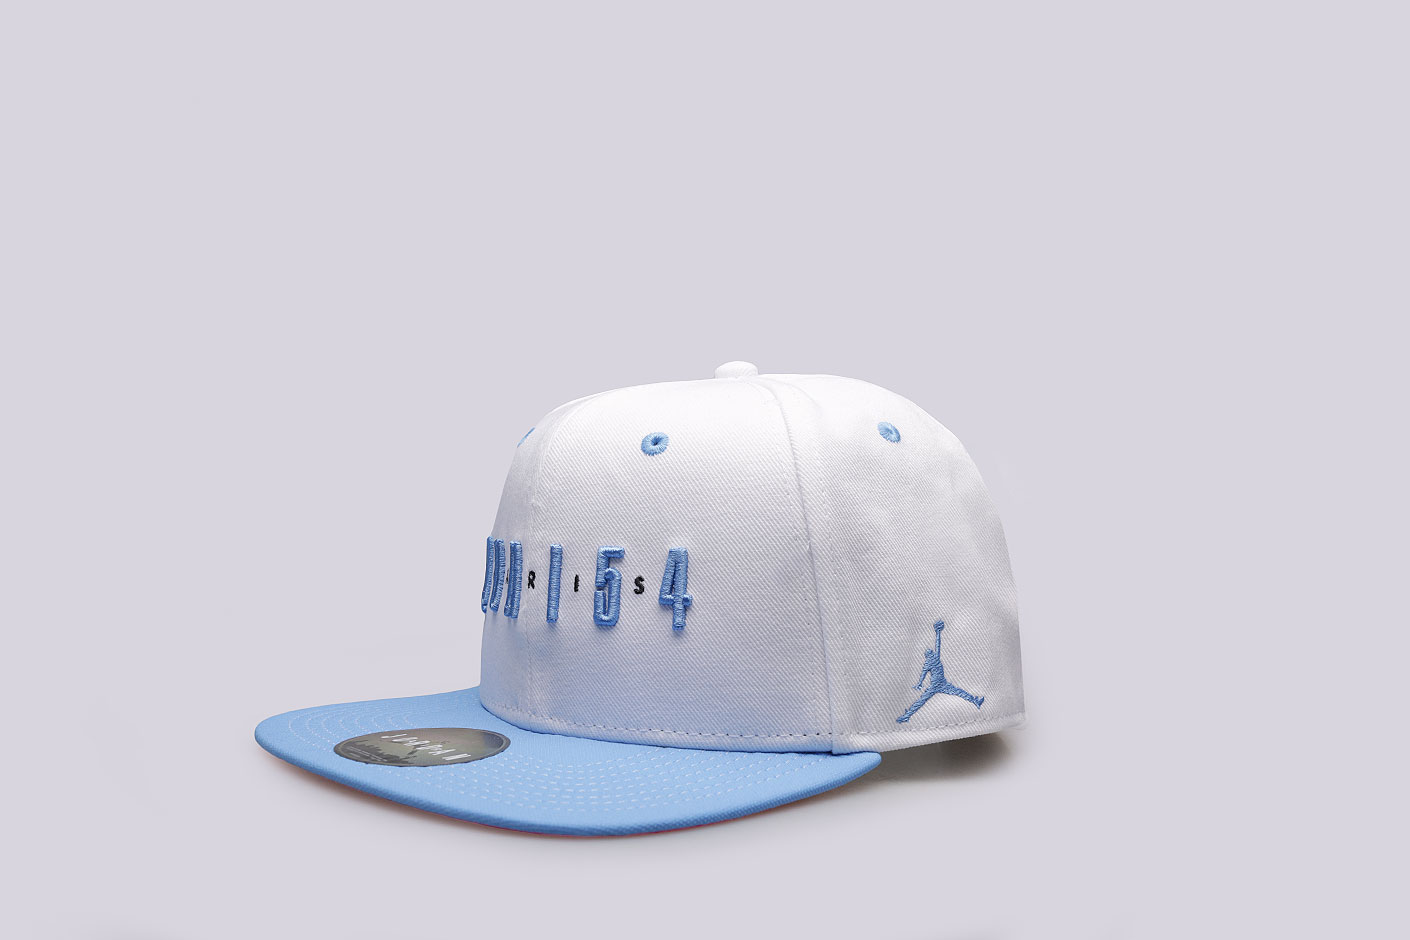 8bdae2a0135 ... белая кепка Jordan Quai 54 Snapback Adjustable Hat - фото 2 картинки ...